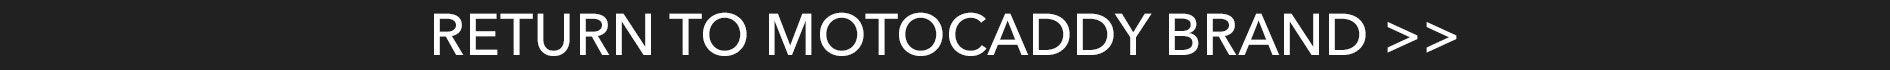 Motocaddy Brand Page